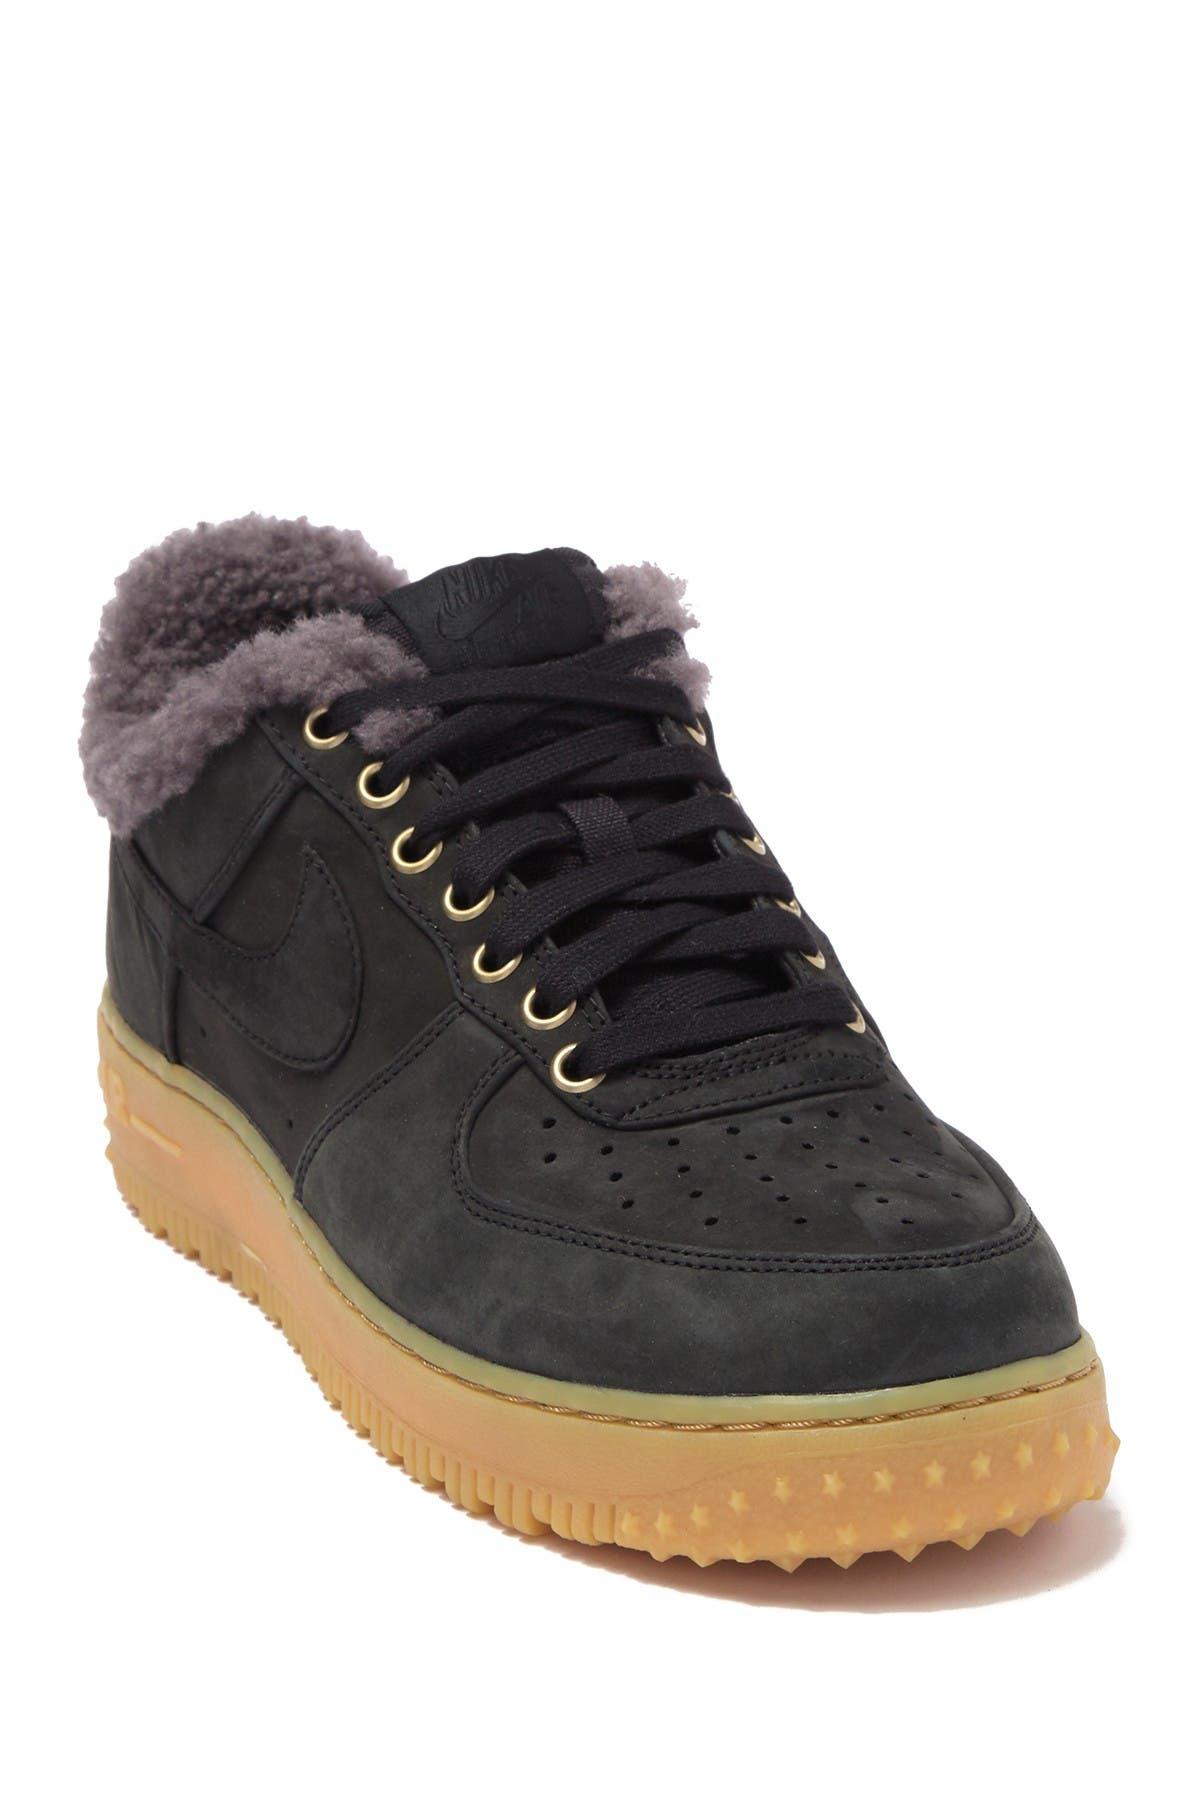 rigidez aburrido Corte de pelo  Nike | Air Force 1 Premium Winter Sneaker | Nordstrom Rack